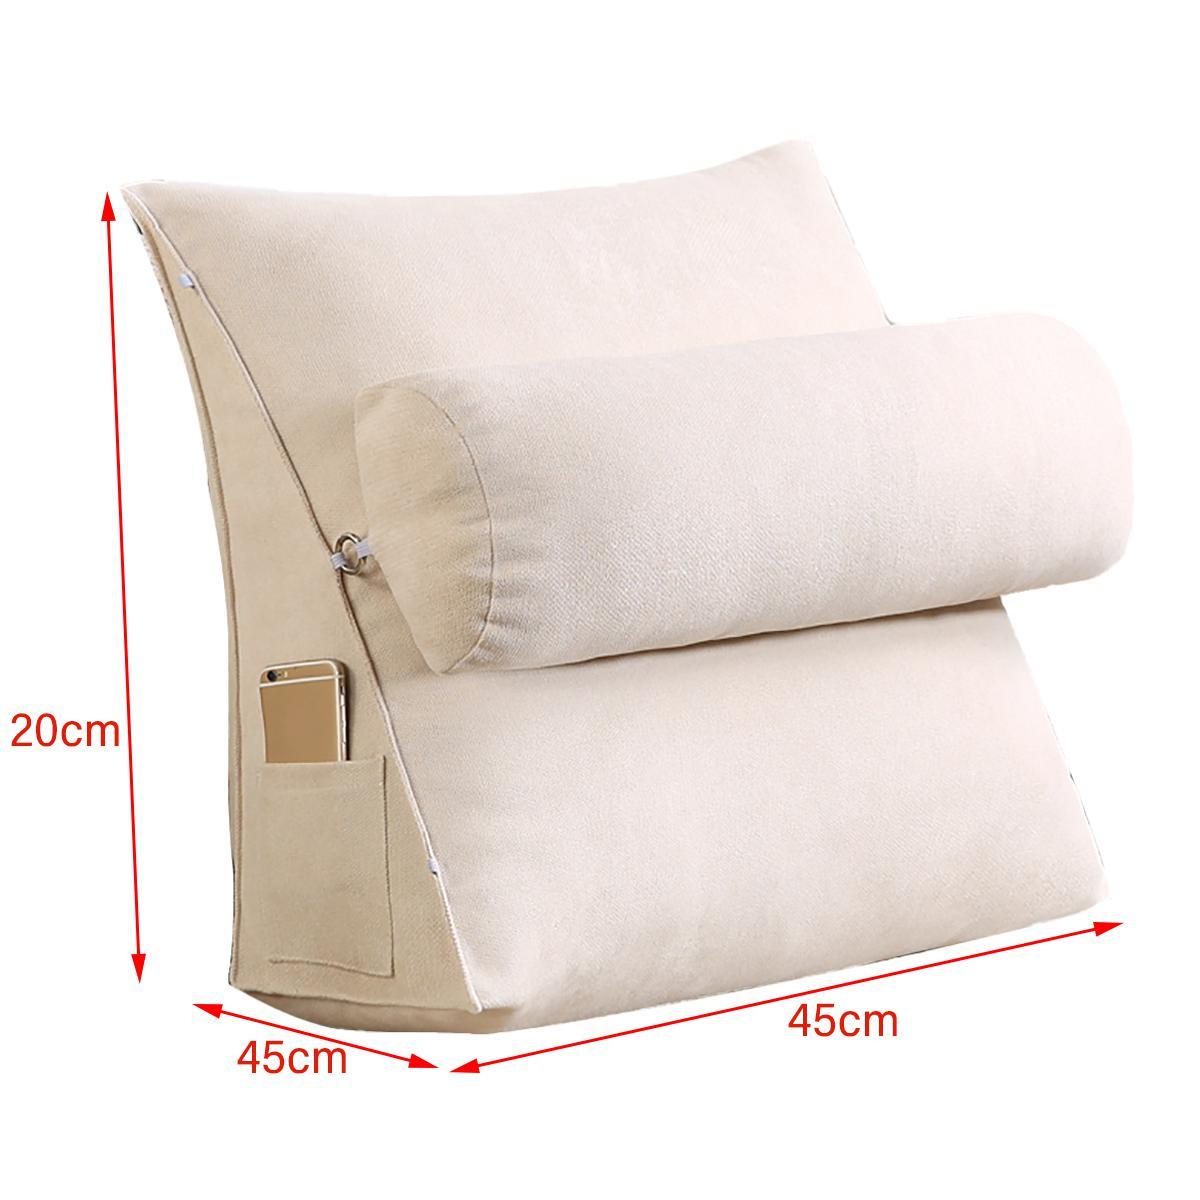 45cm wedge back pillow rest sleep neck home sofa bed lumbar office cushion